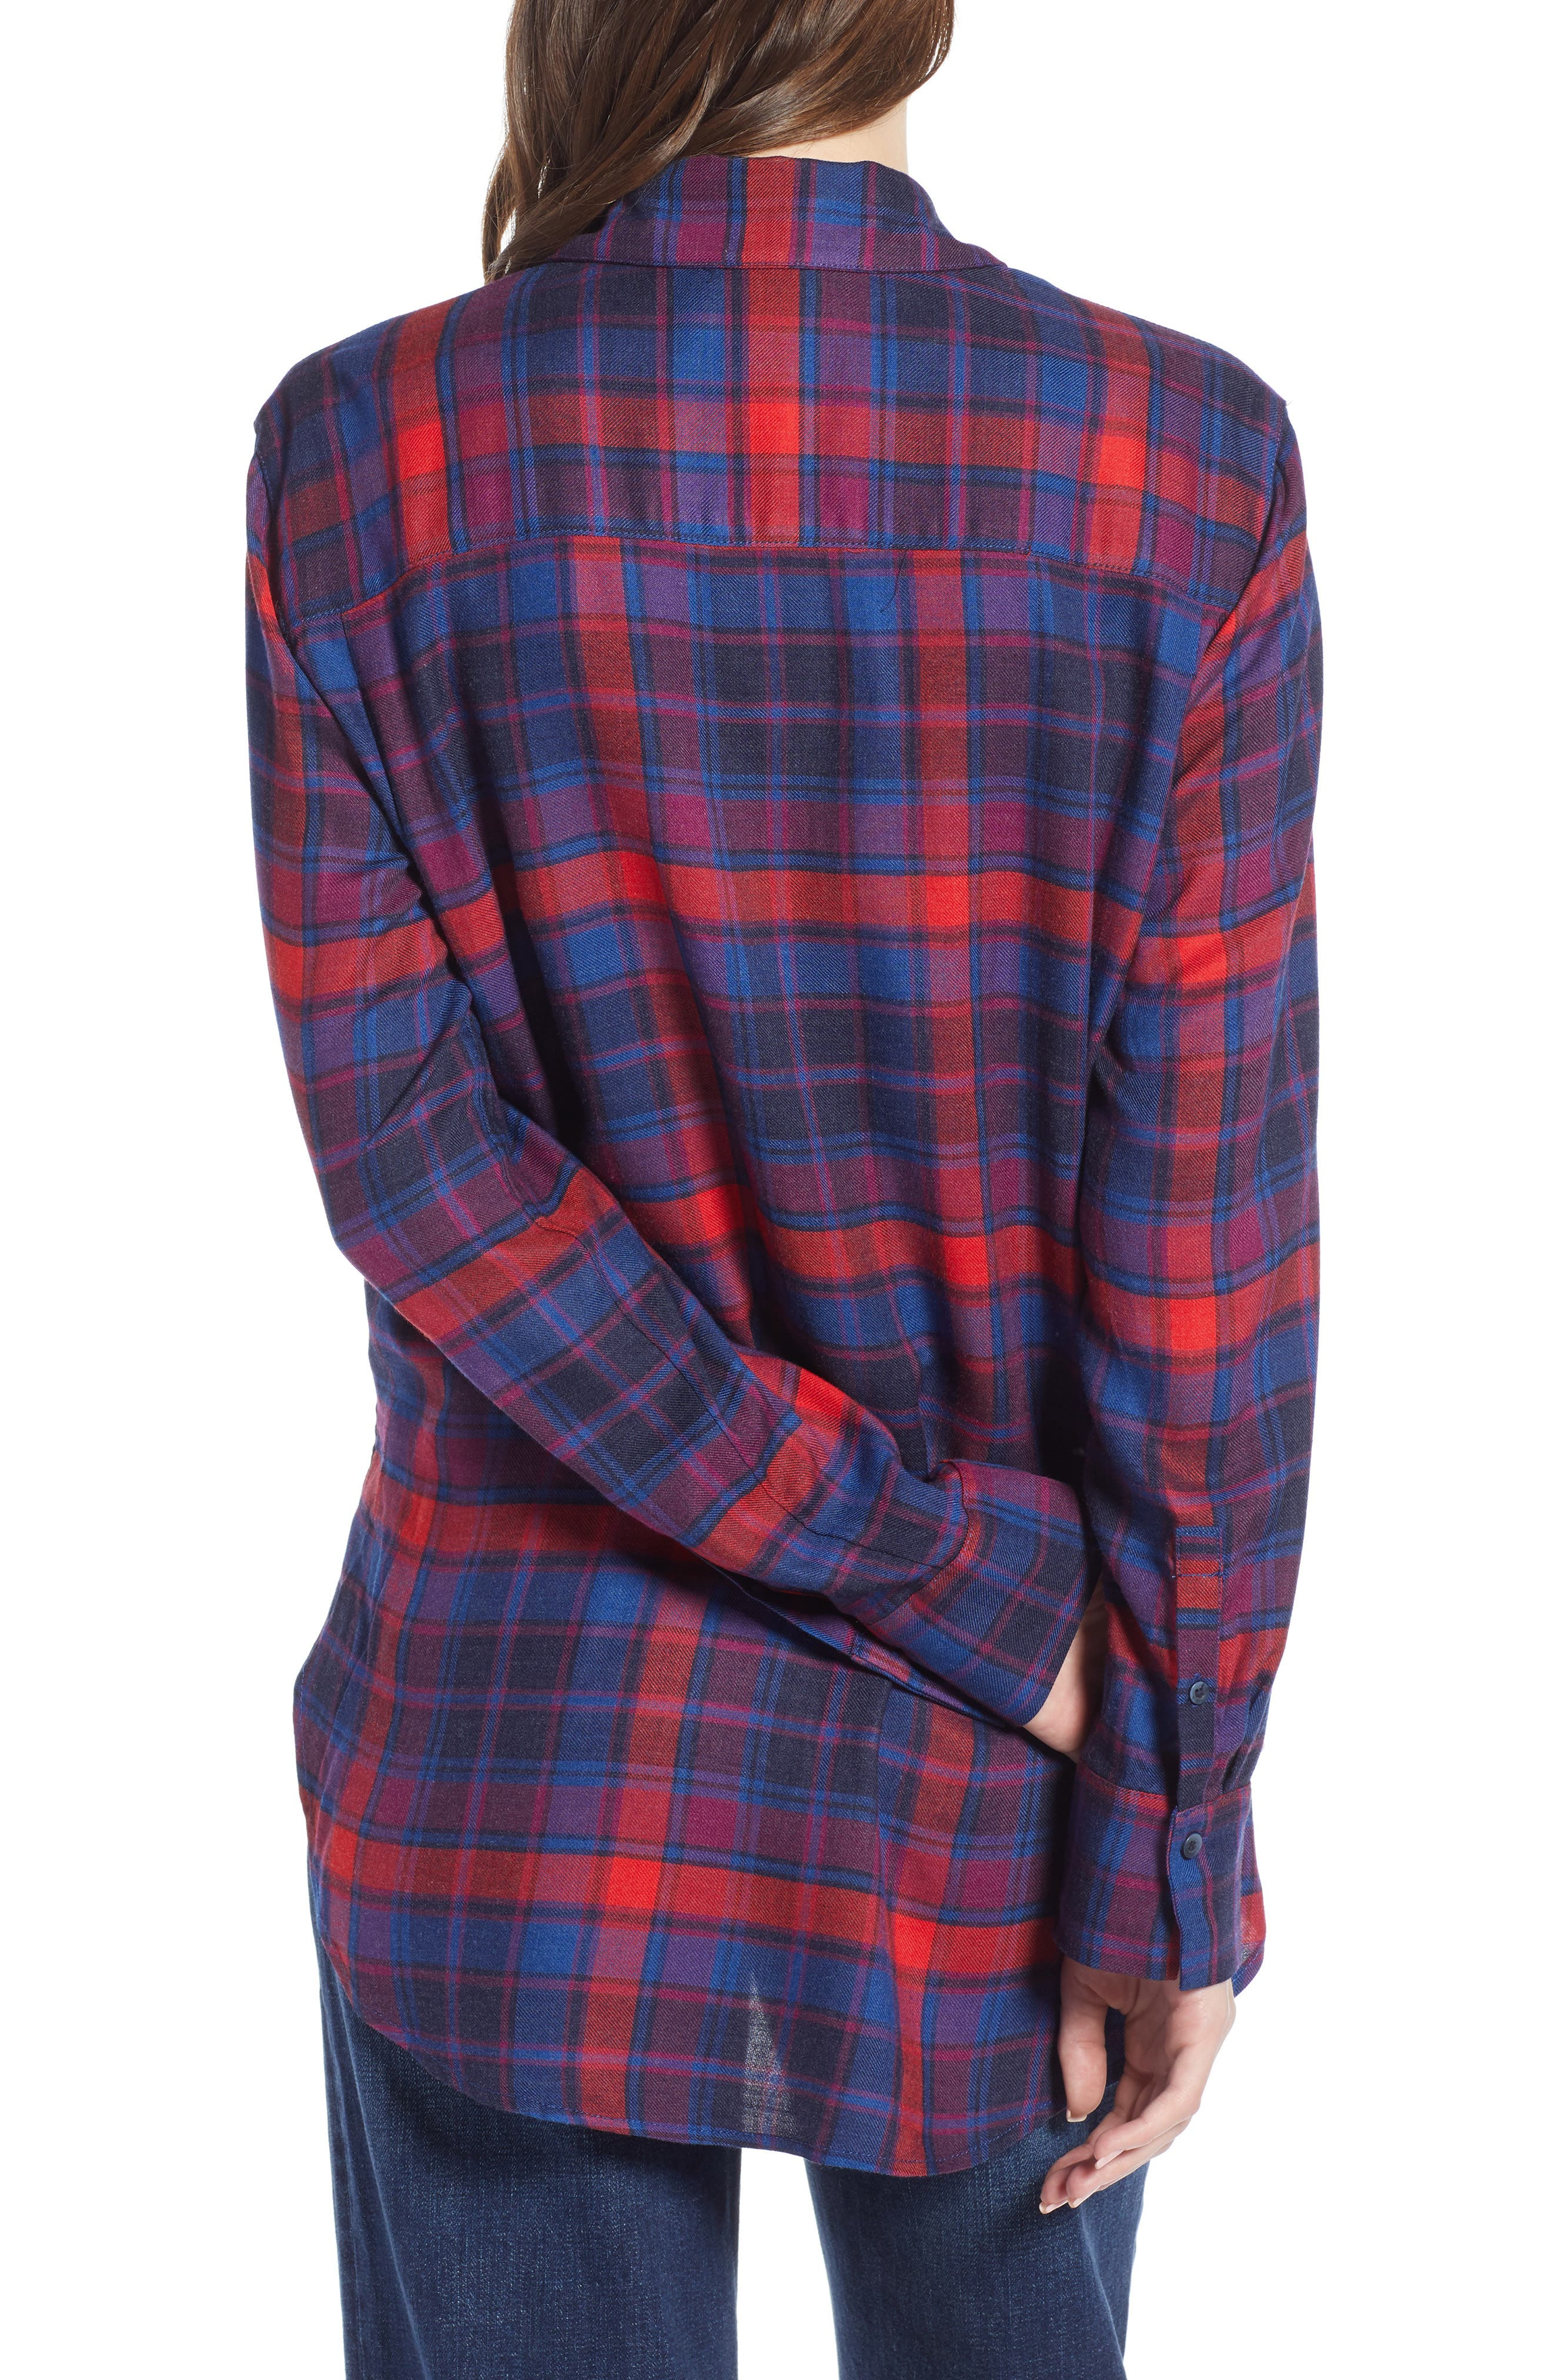 Plaid Boyfriend Shirt,                             Alternate thumbnail 2, color,                             BLUE SODALIGHT BEAMING PLAID